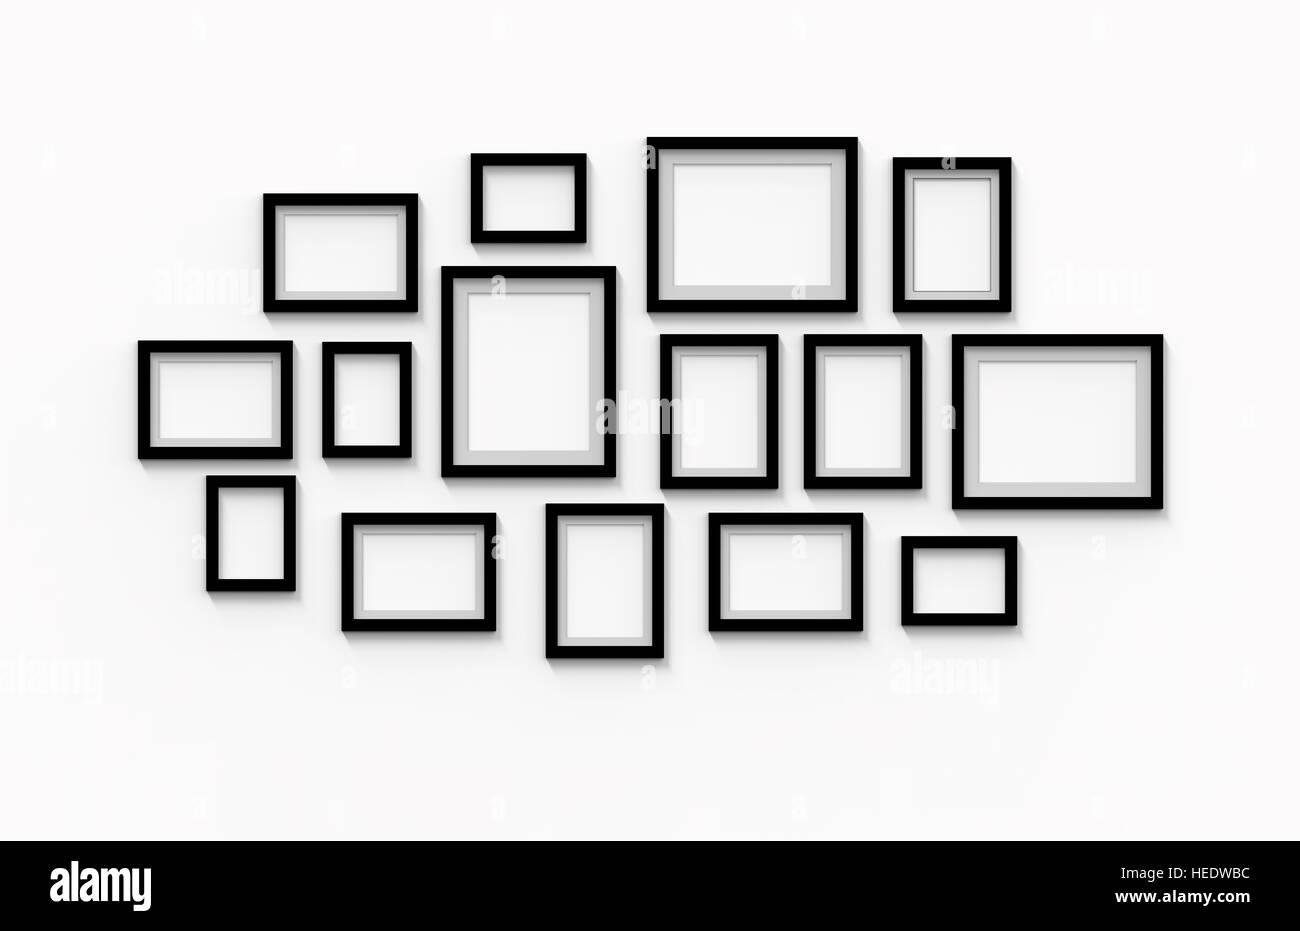 viele leere schwarze Bilderrahmen an der Wand hängen, 3D-Rendering ...